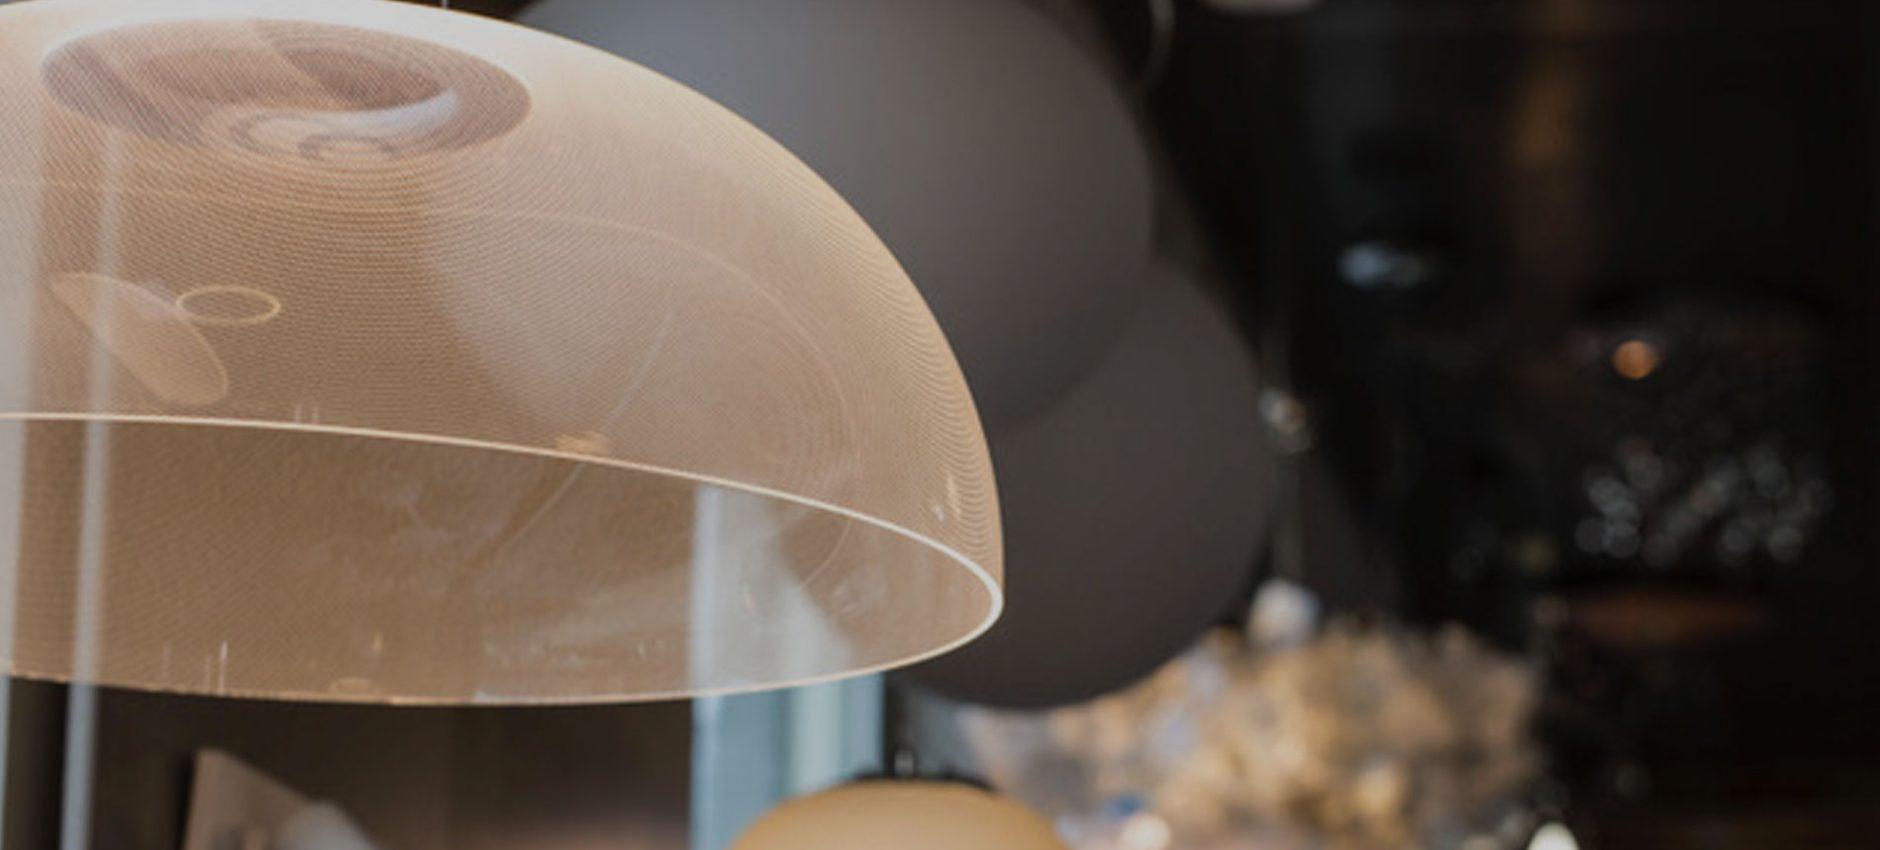 cdl-luce-vendita-lampade-da-soffitto.jpg